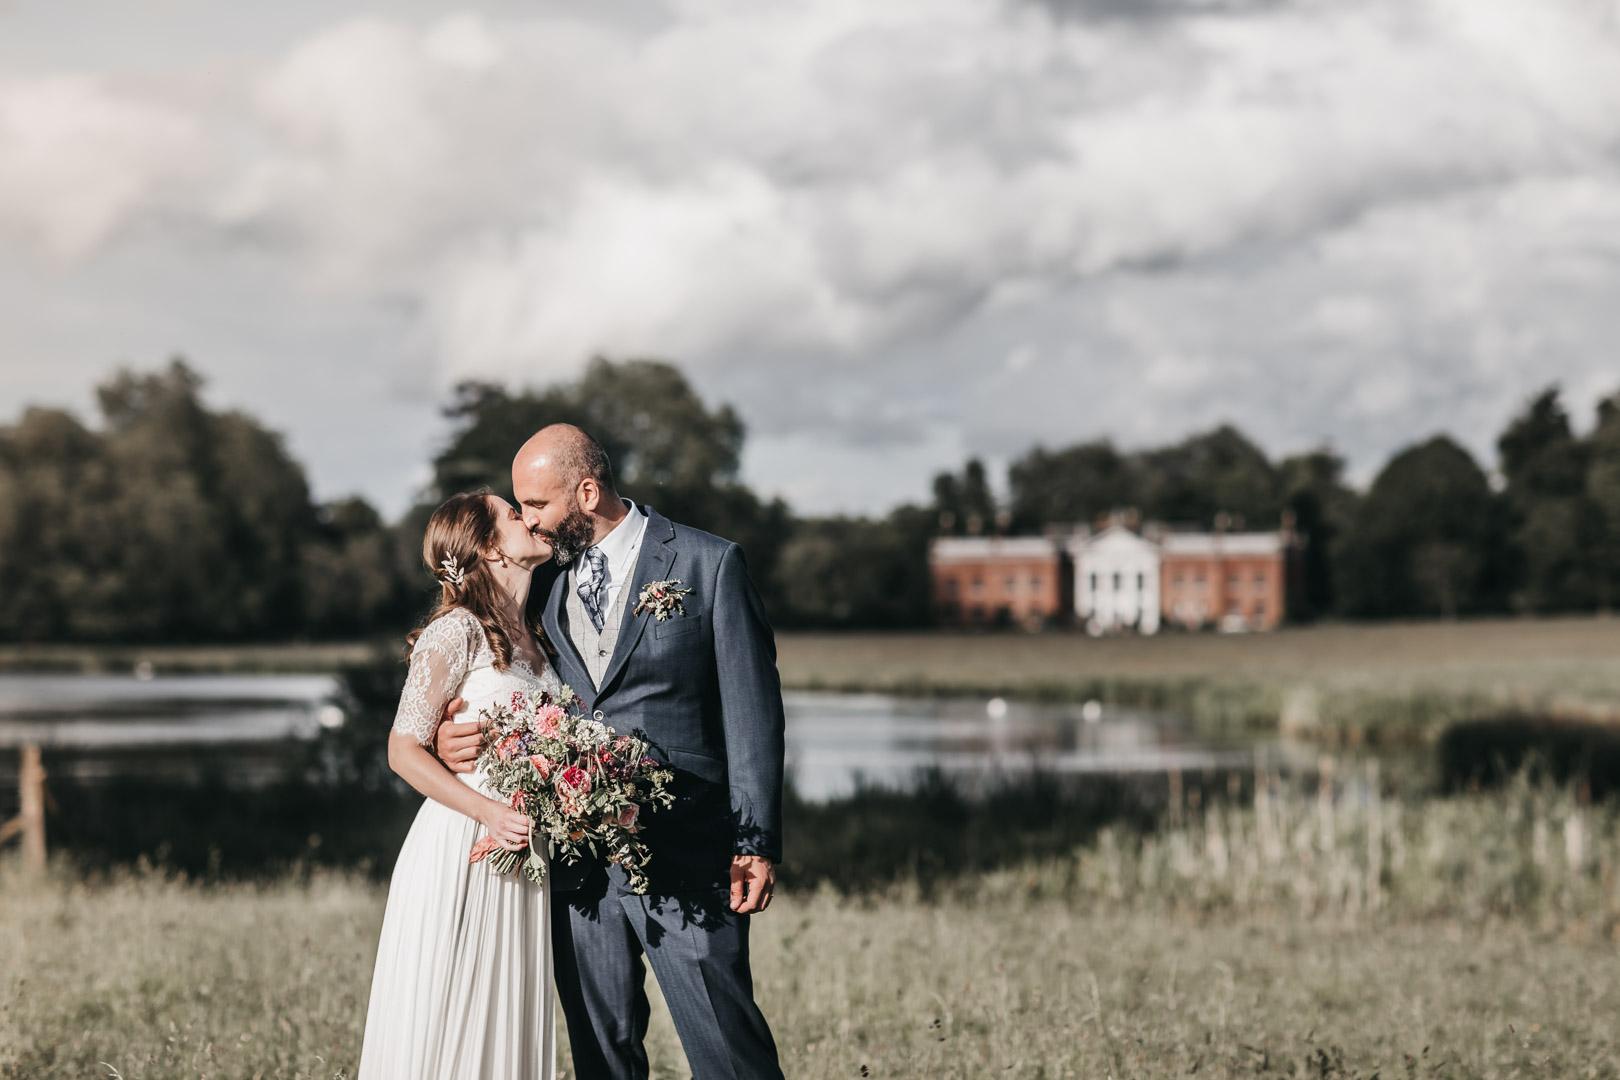 benwigglesworth.com - Wedding Photography Cornwall-18.jpg